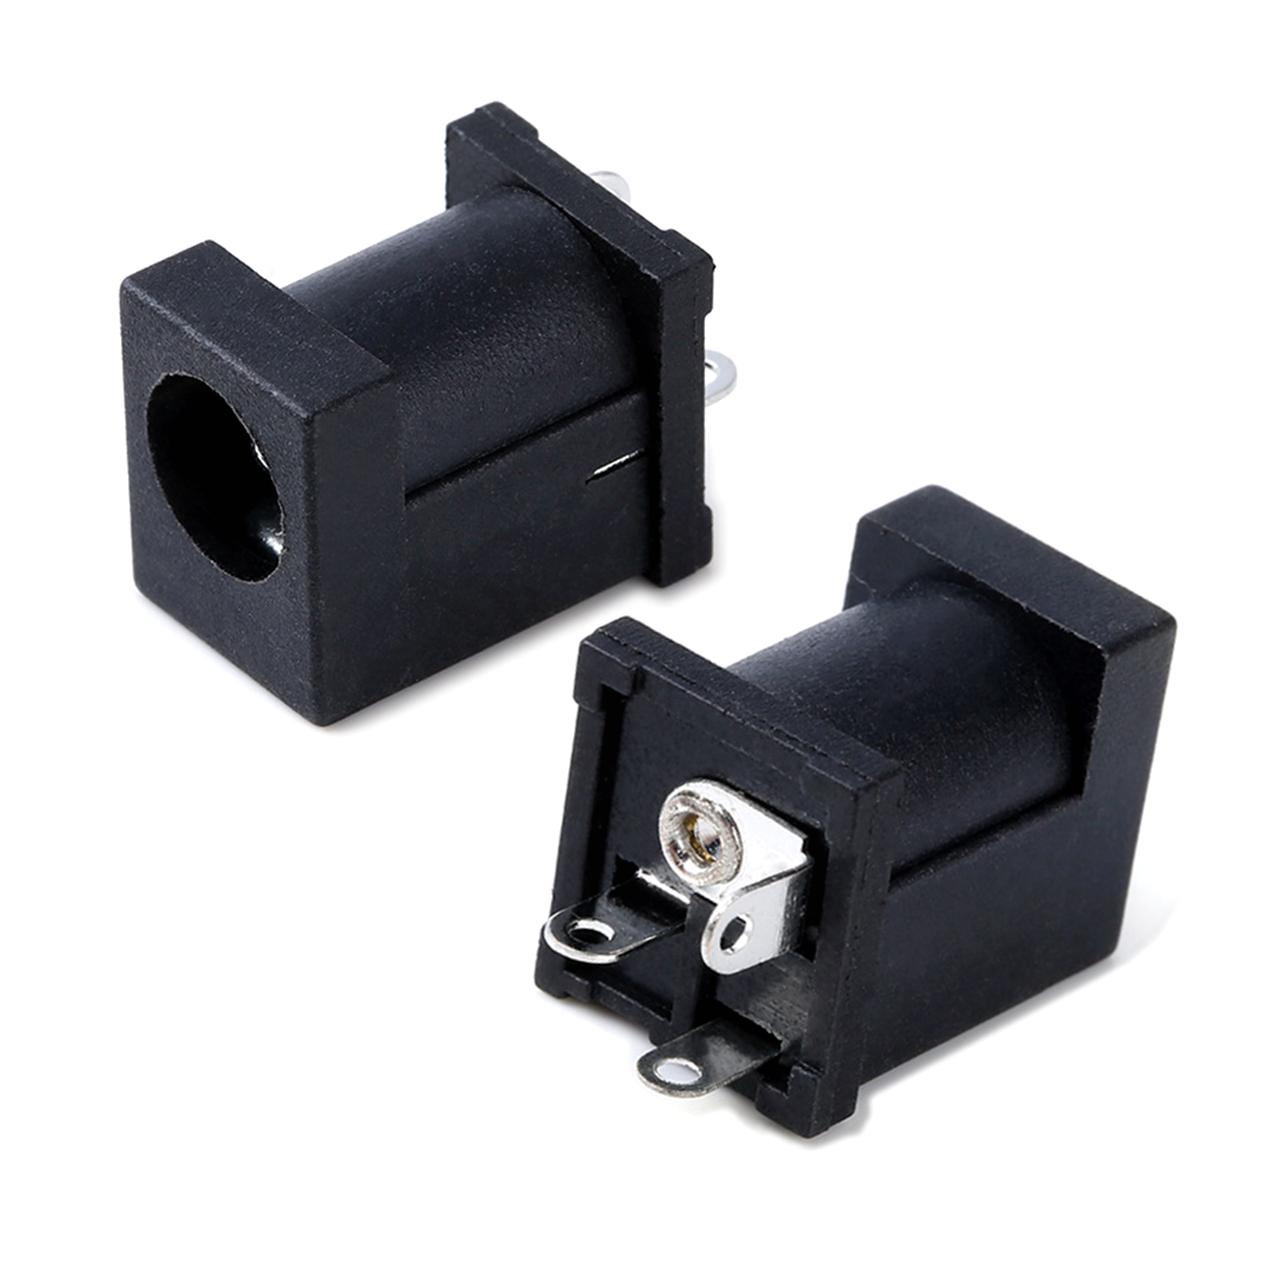 DC012AФ2.0/2.5 6.3(14*10*11) 180°短脚 DC电源插座